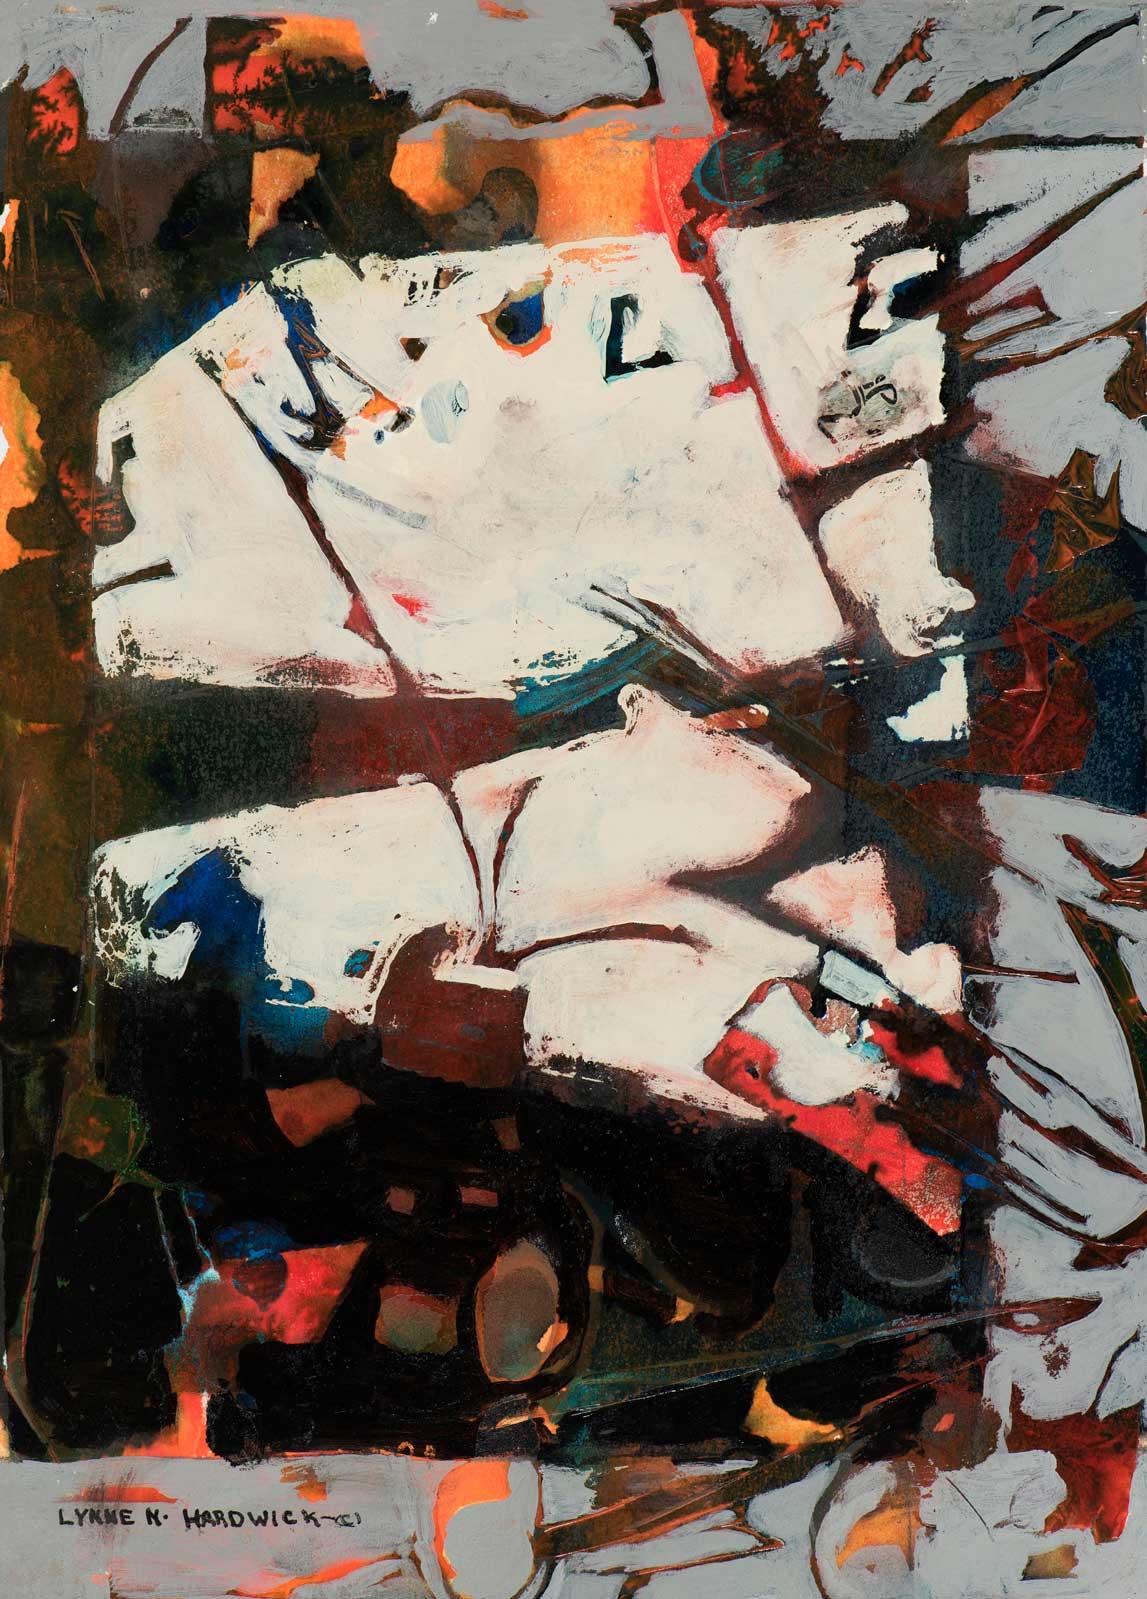 Lynne Hardwick, Nomads-Vision-VIII, Mixed Media, 24x27